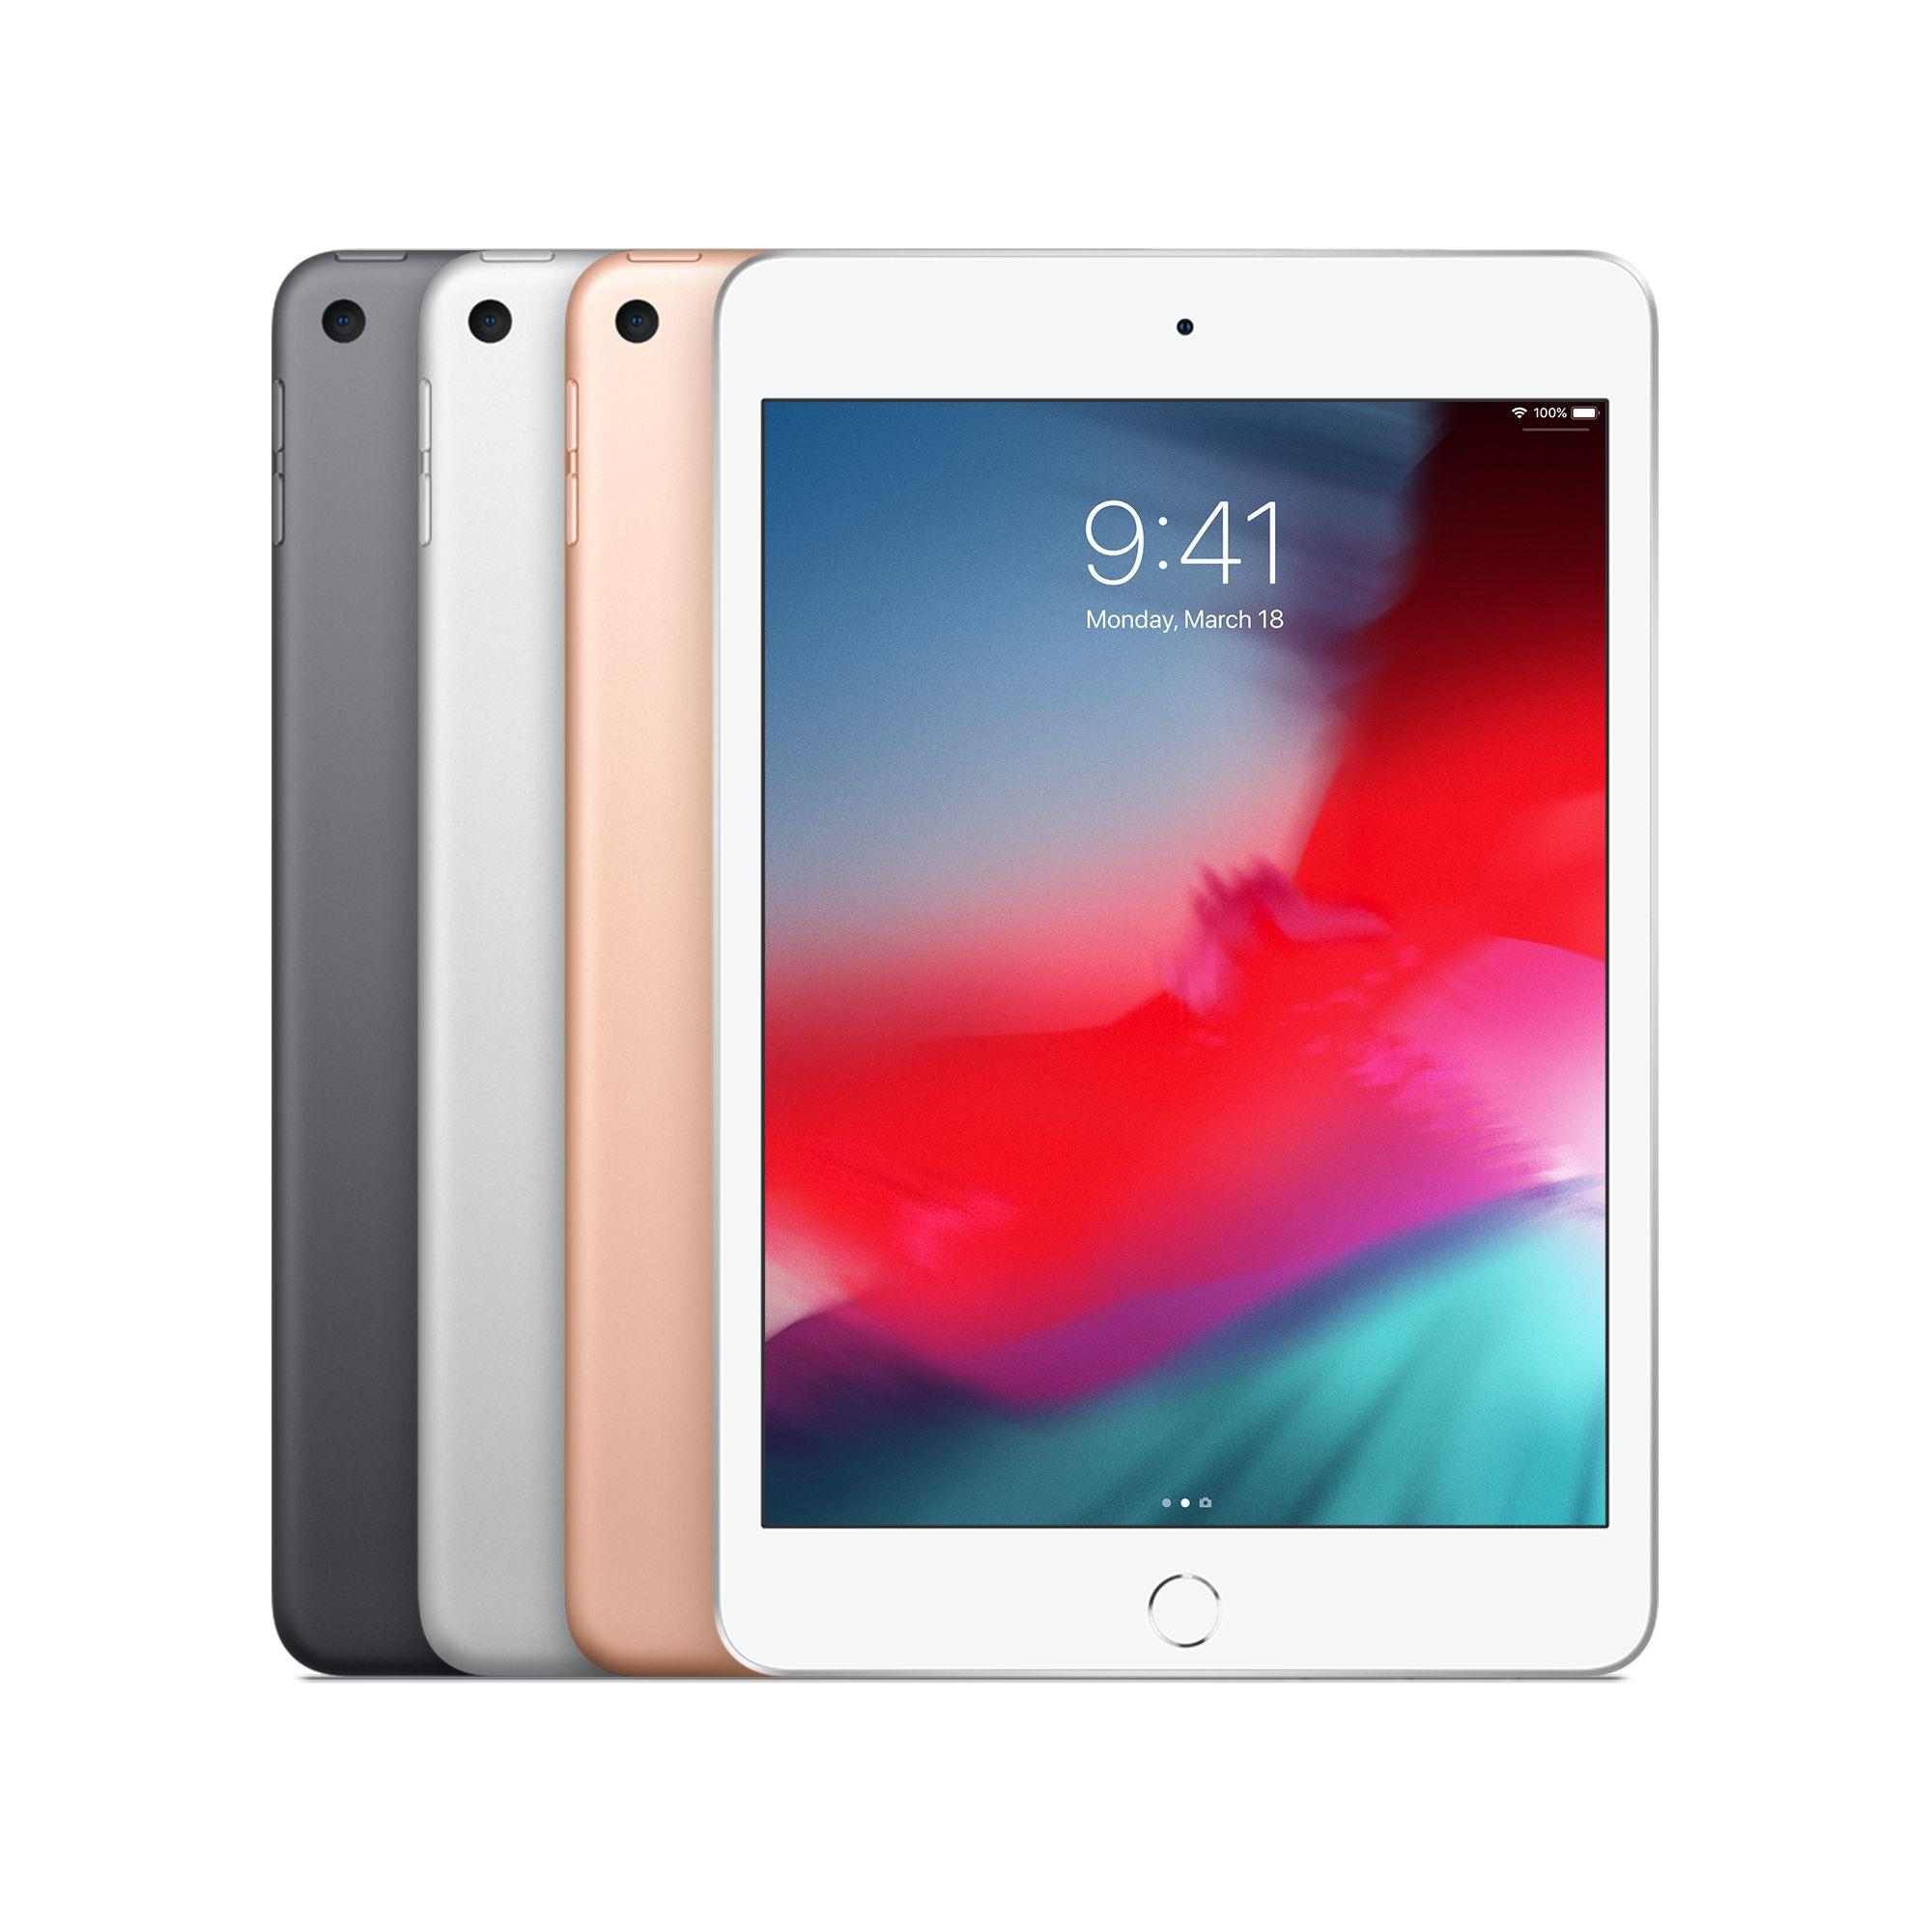 "Bildergebnis für iPad mini 5"""